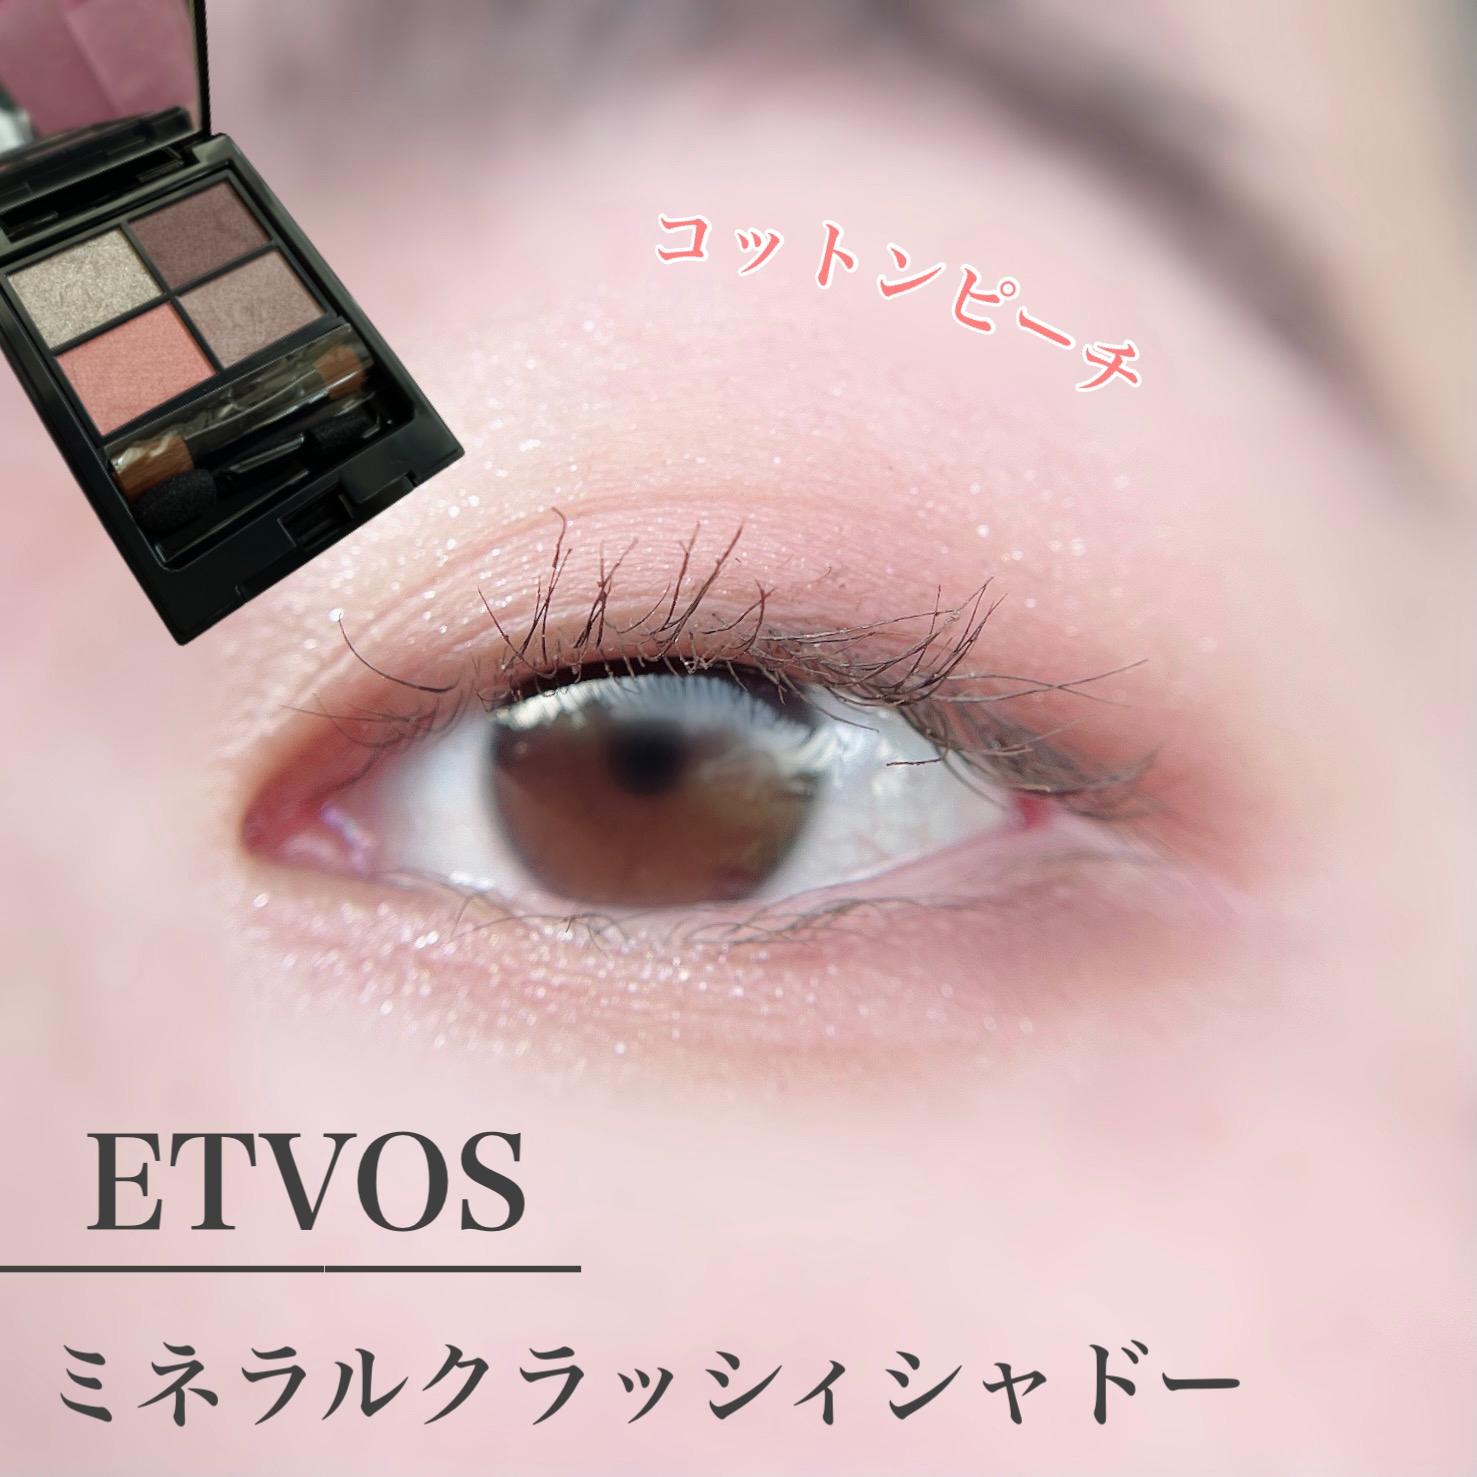 ETVOS(エトヴォス)ミネラルクラッシィシャドーを使ったあひるさんのクチコミ画像1